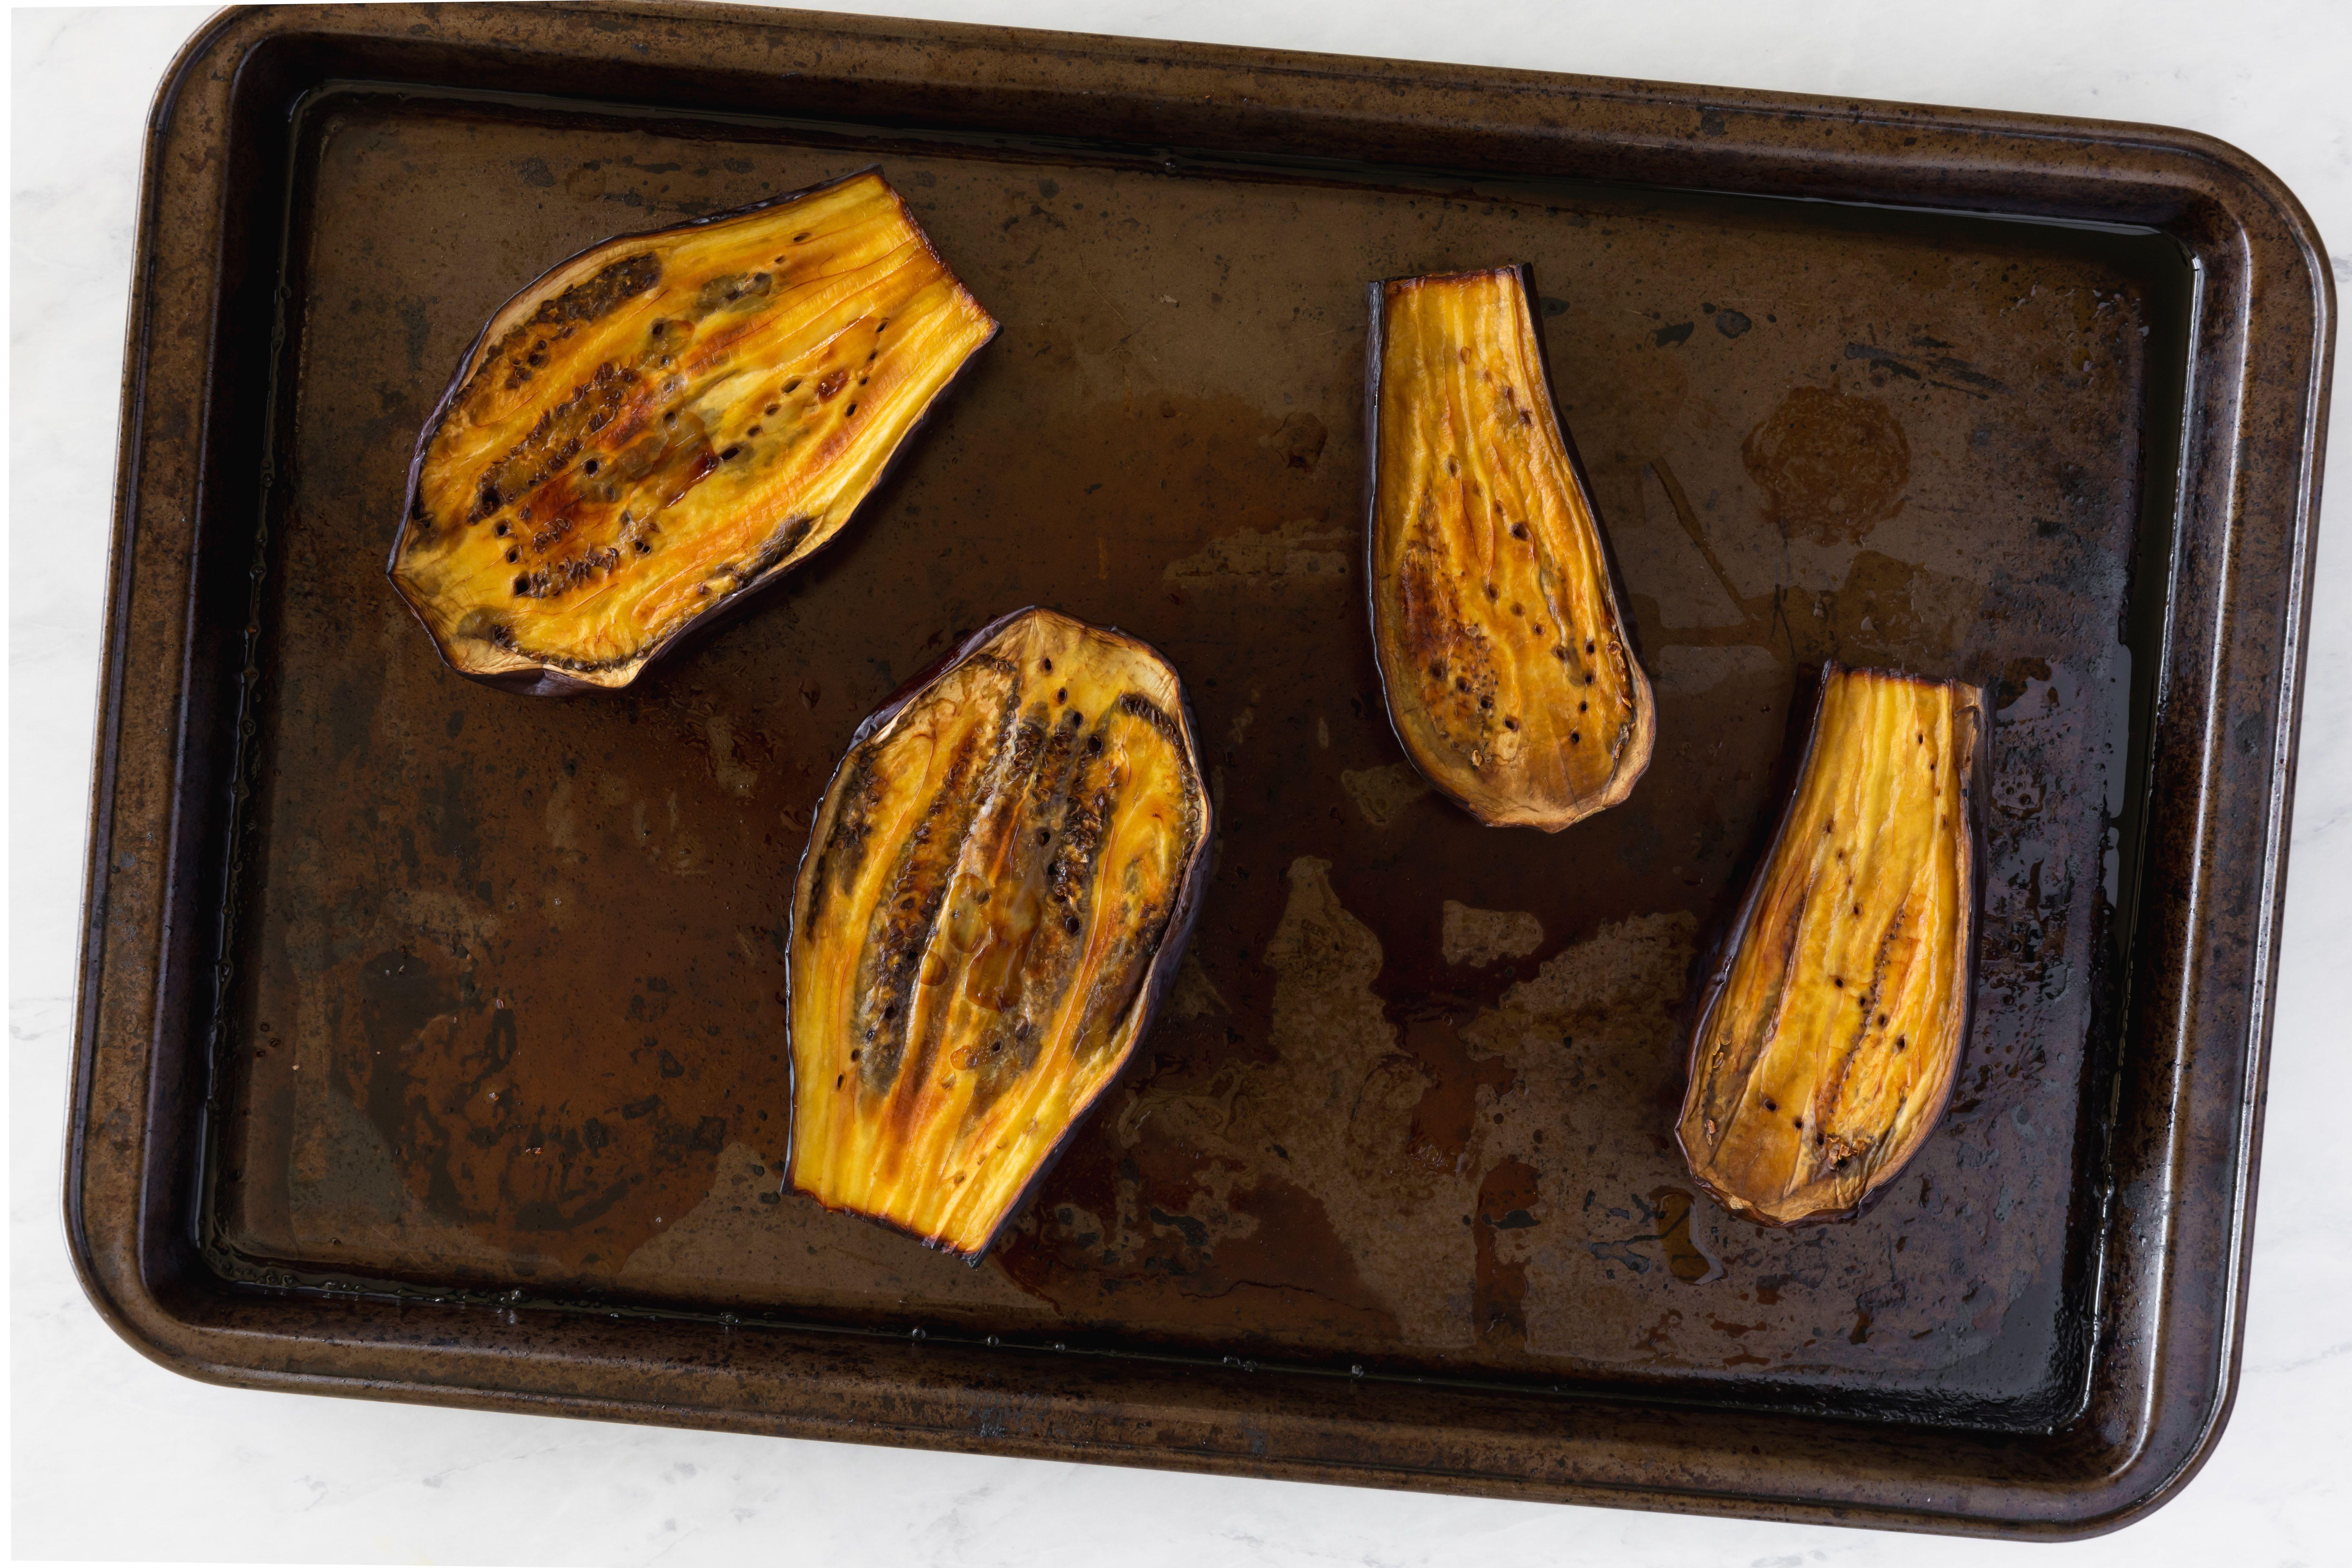 Roast sliced eggplants in the oven